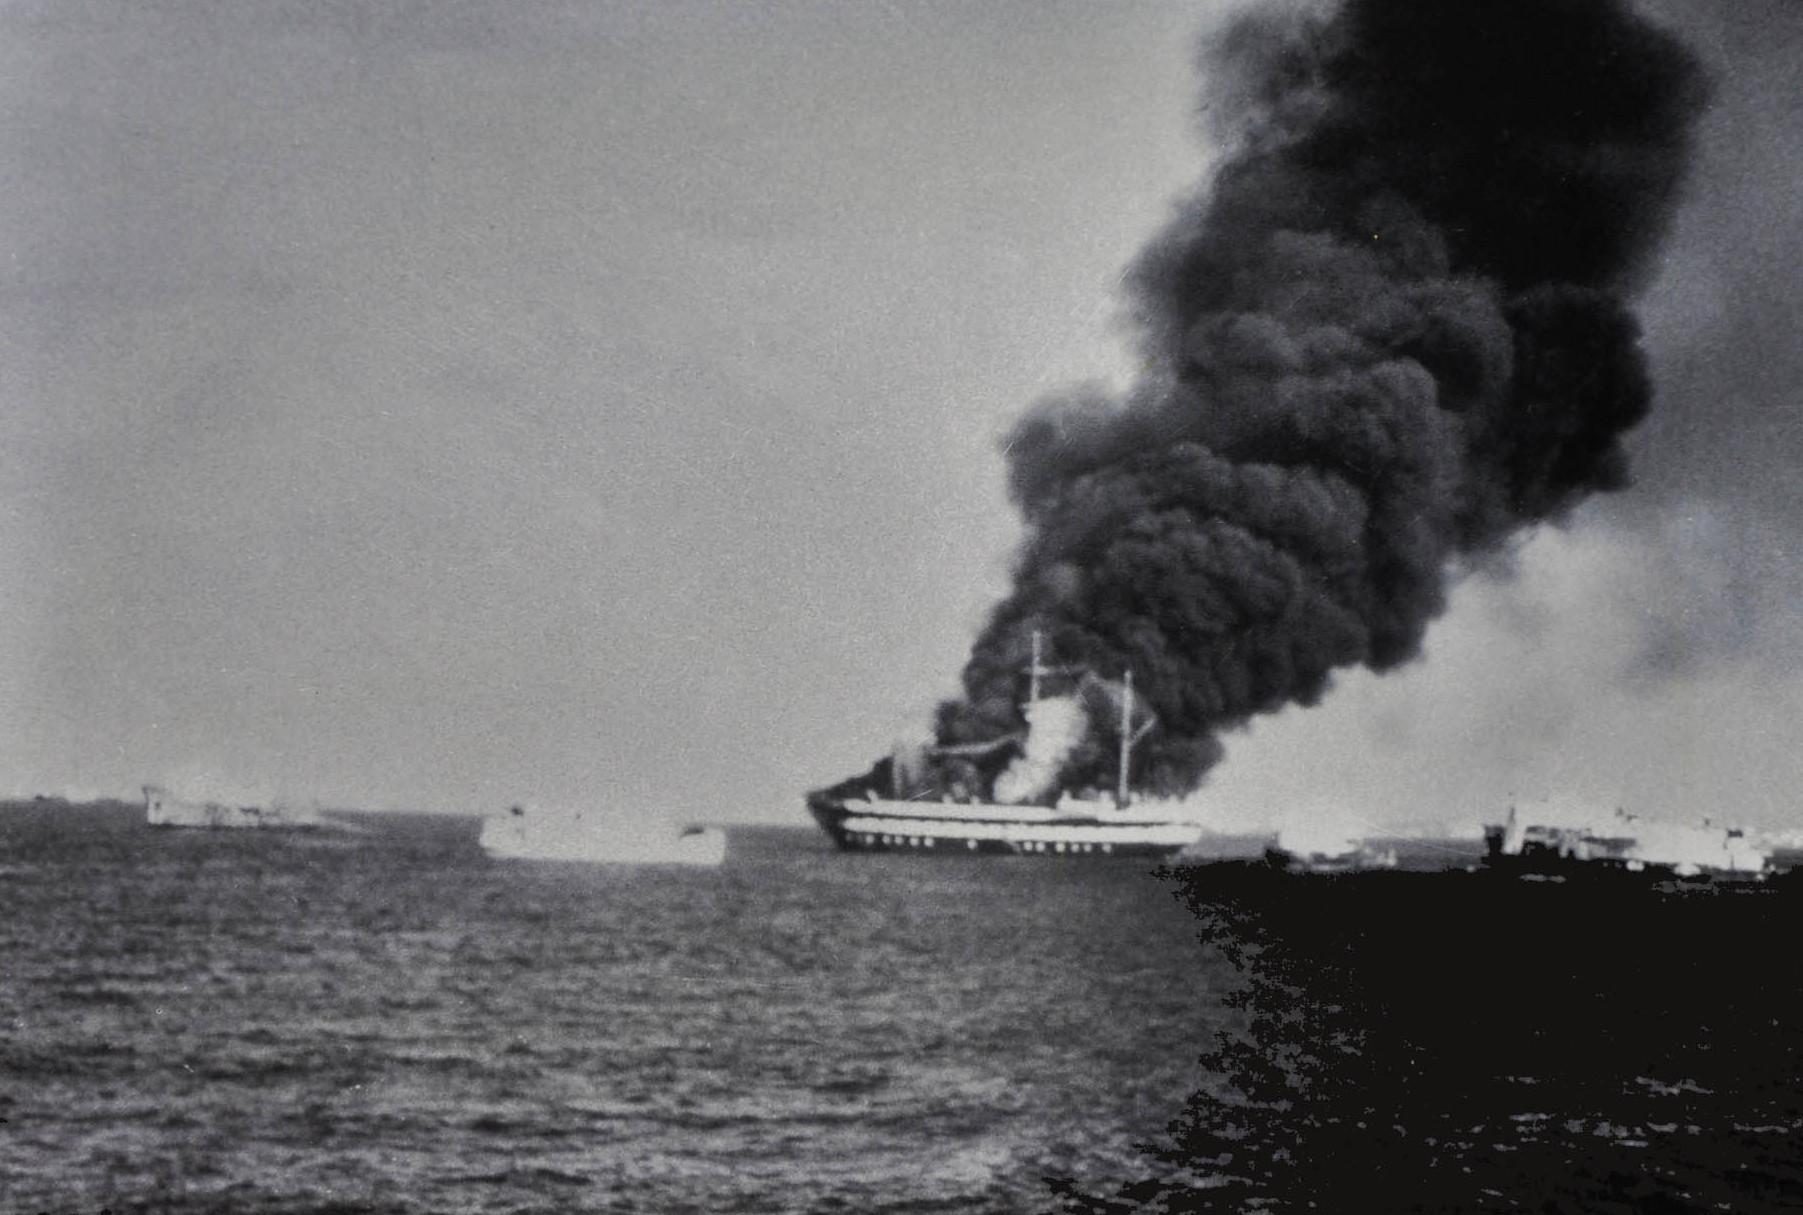 Пожар на учебном судне «Дон Фернанду II э Глория» 3 апреля 1963 г. Фото в экспозиции на борту корабля-музея.